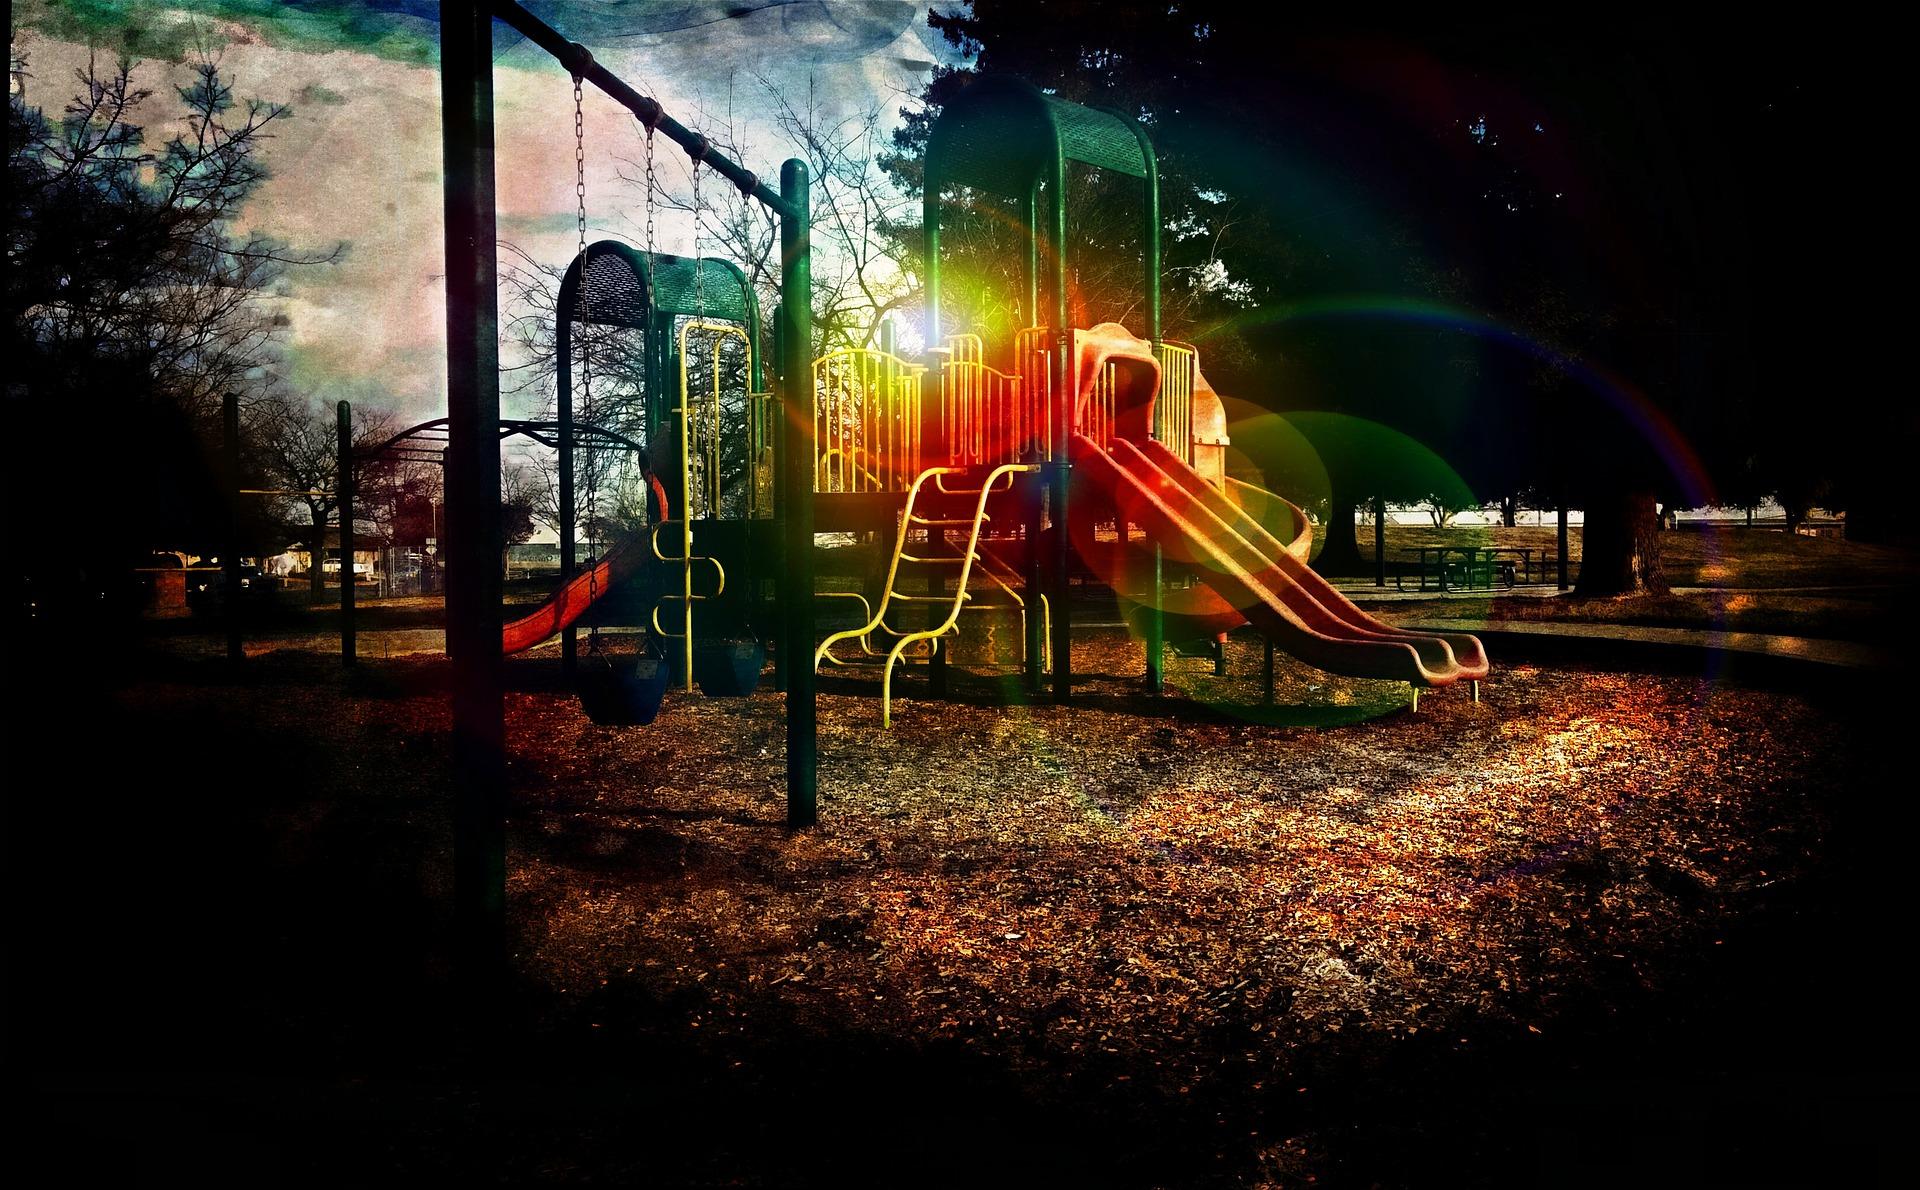 park-1608727_1920